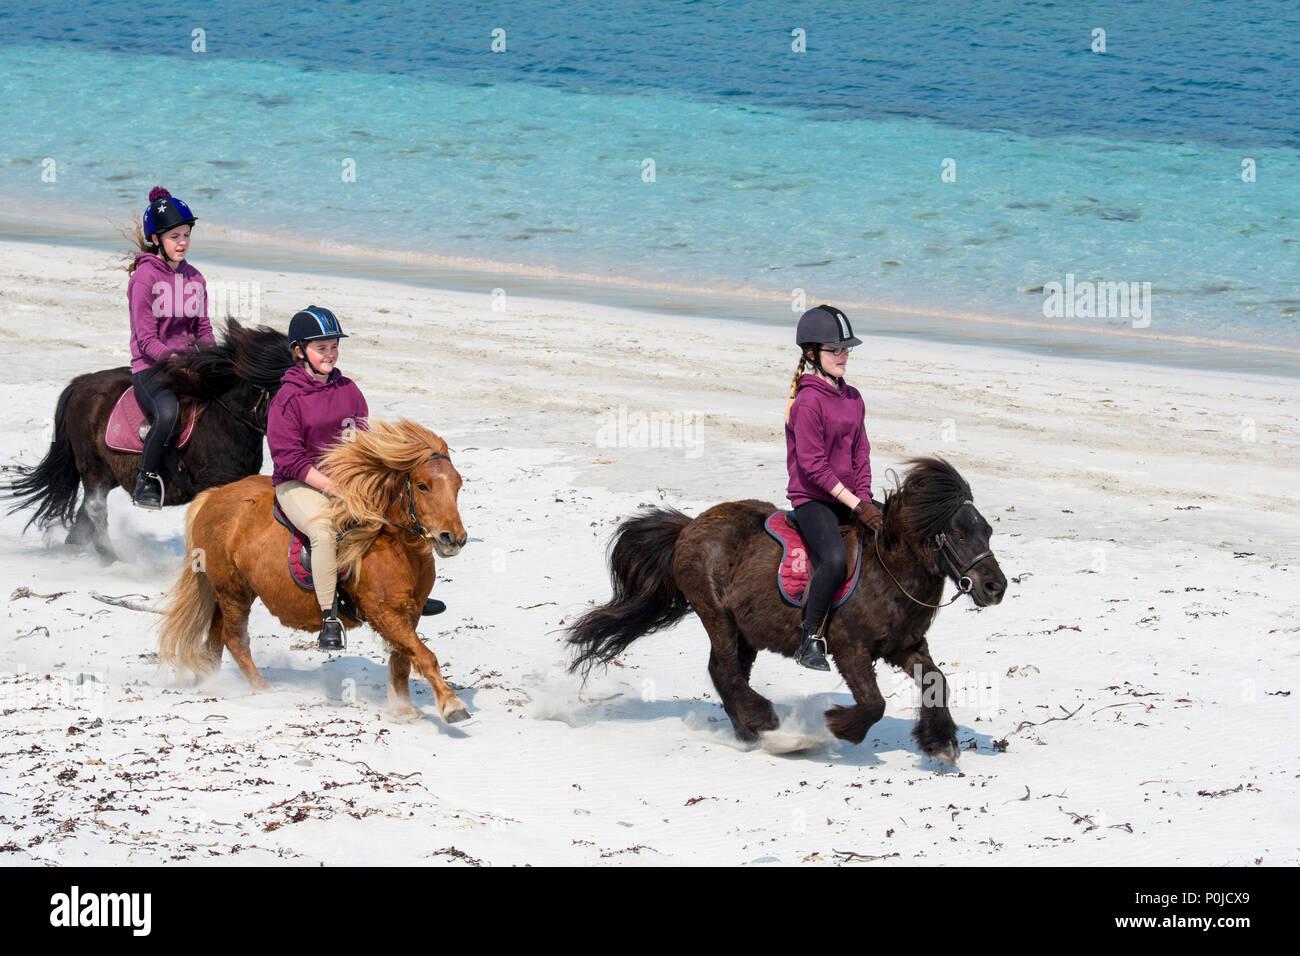 Three young girls / teenagers riding Shetland ponies on sandy beach along the Scottish coast on the Shetland Islands, Scotland, UK - Stock Image